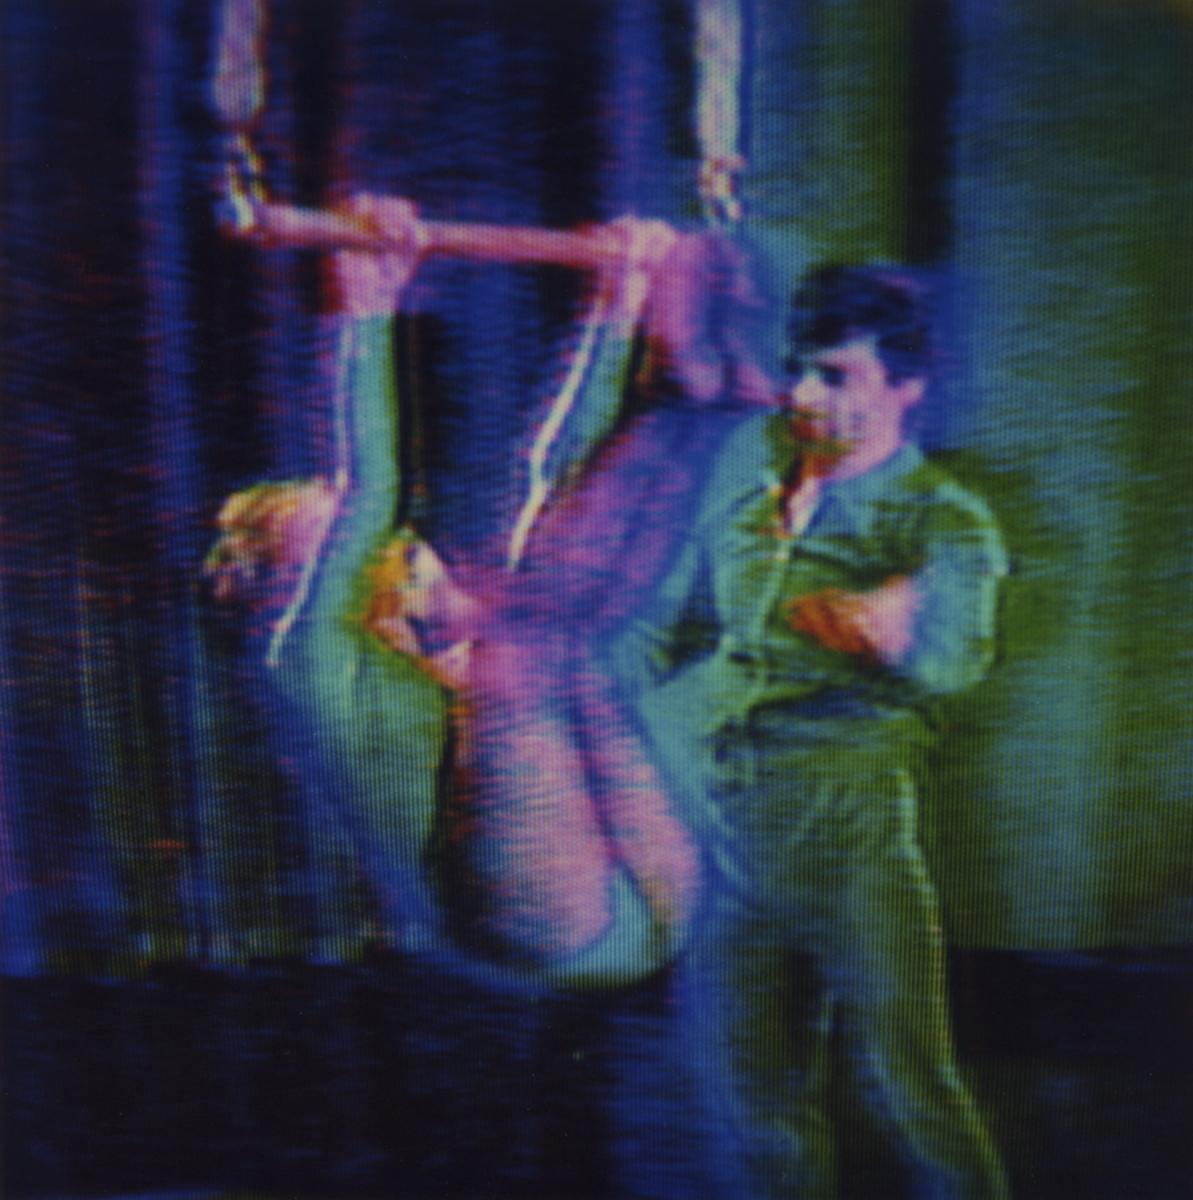 Television-TV-Polaroid-SX70-Trapeze-Surreal.jpg